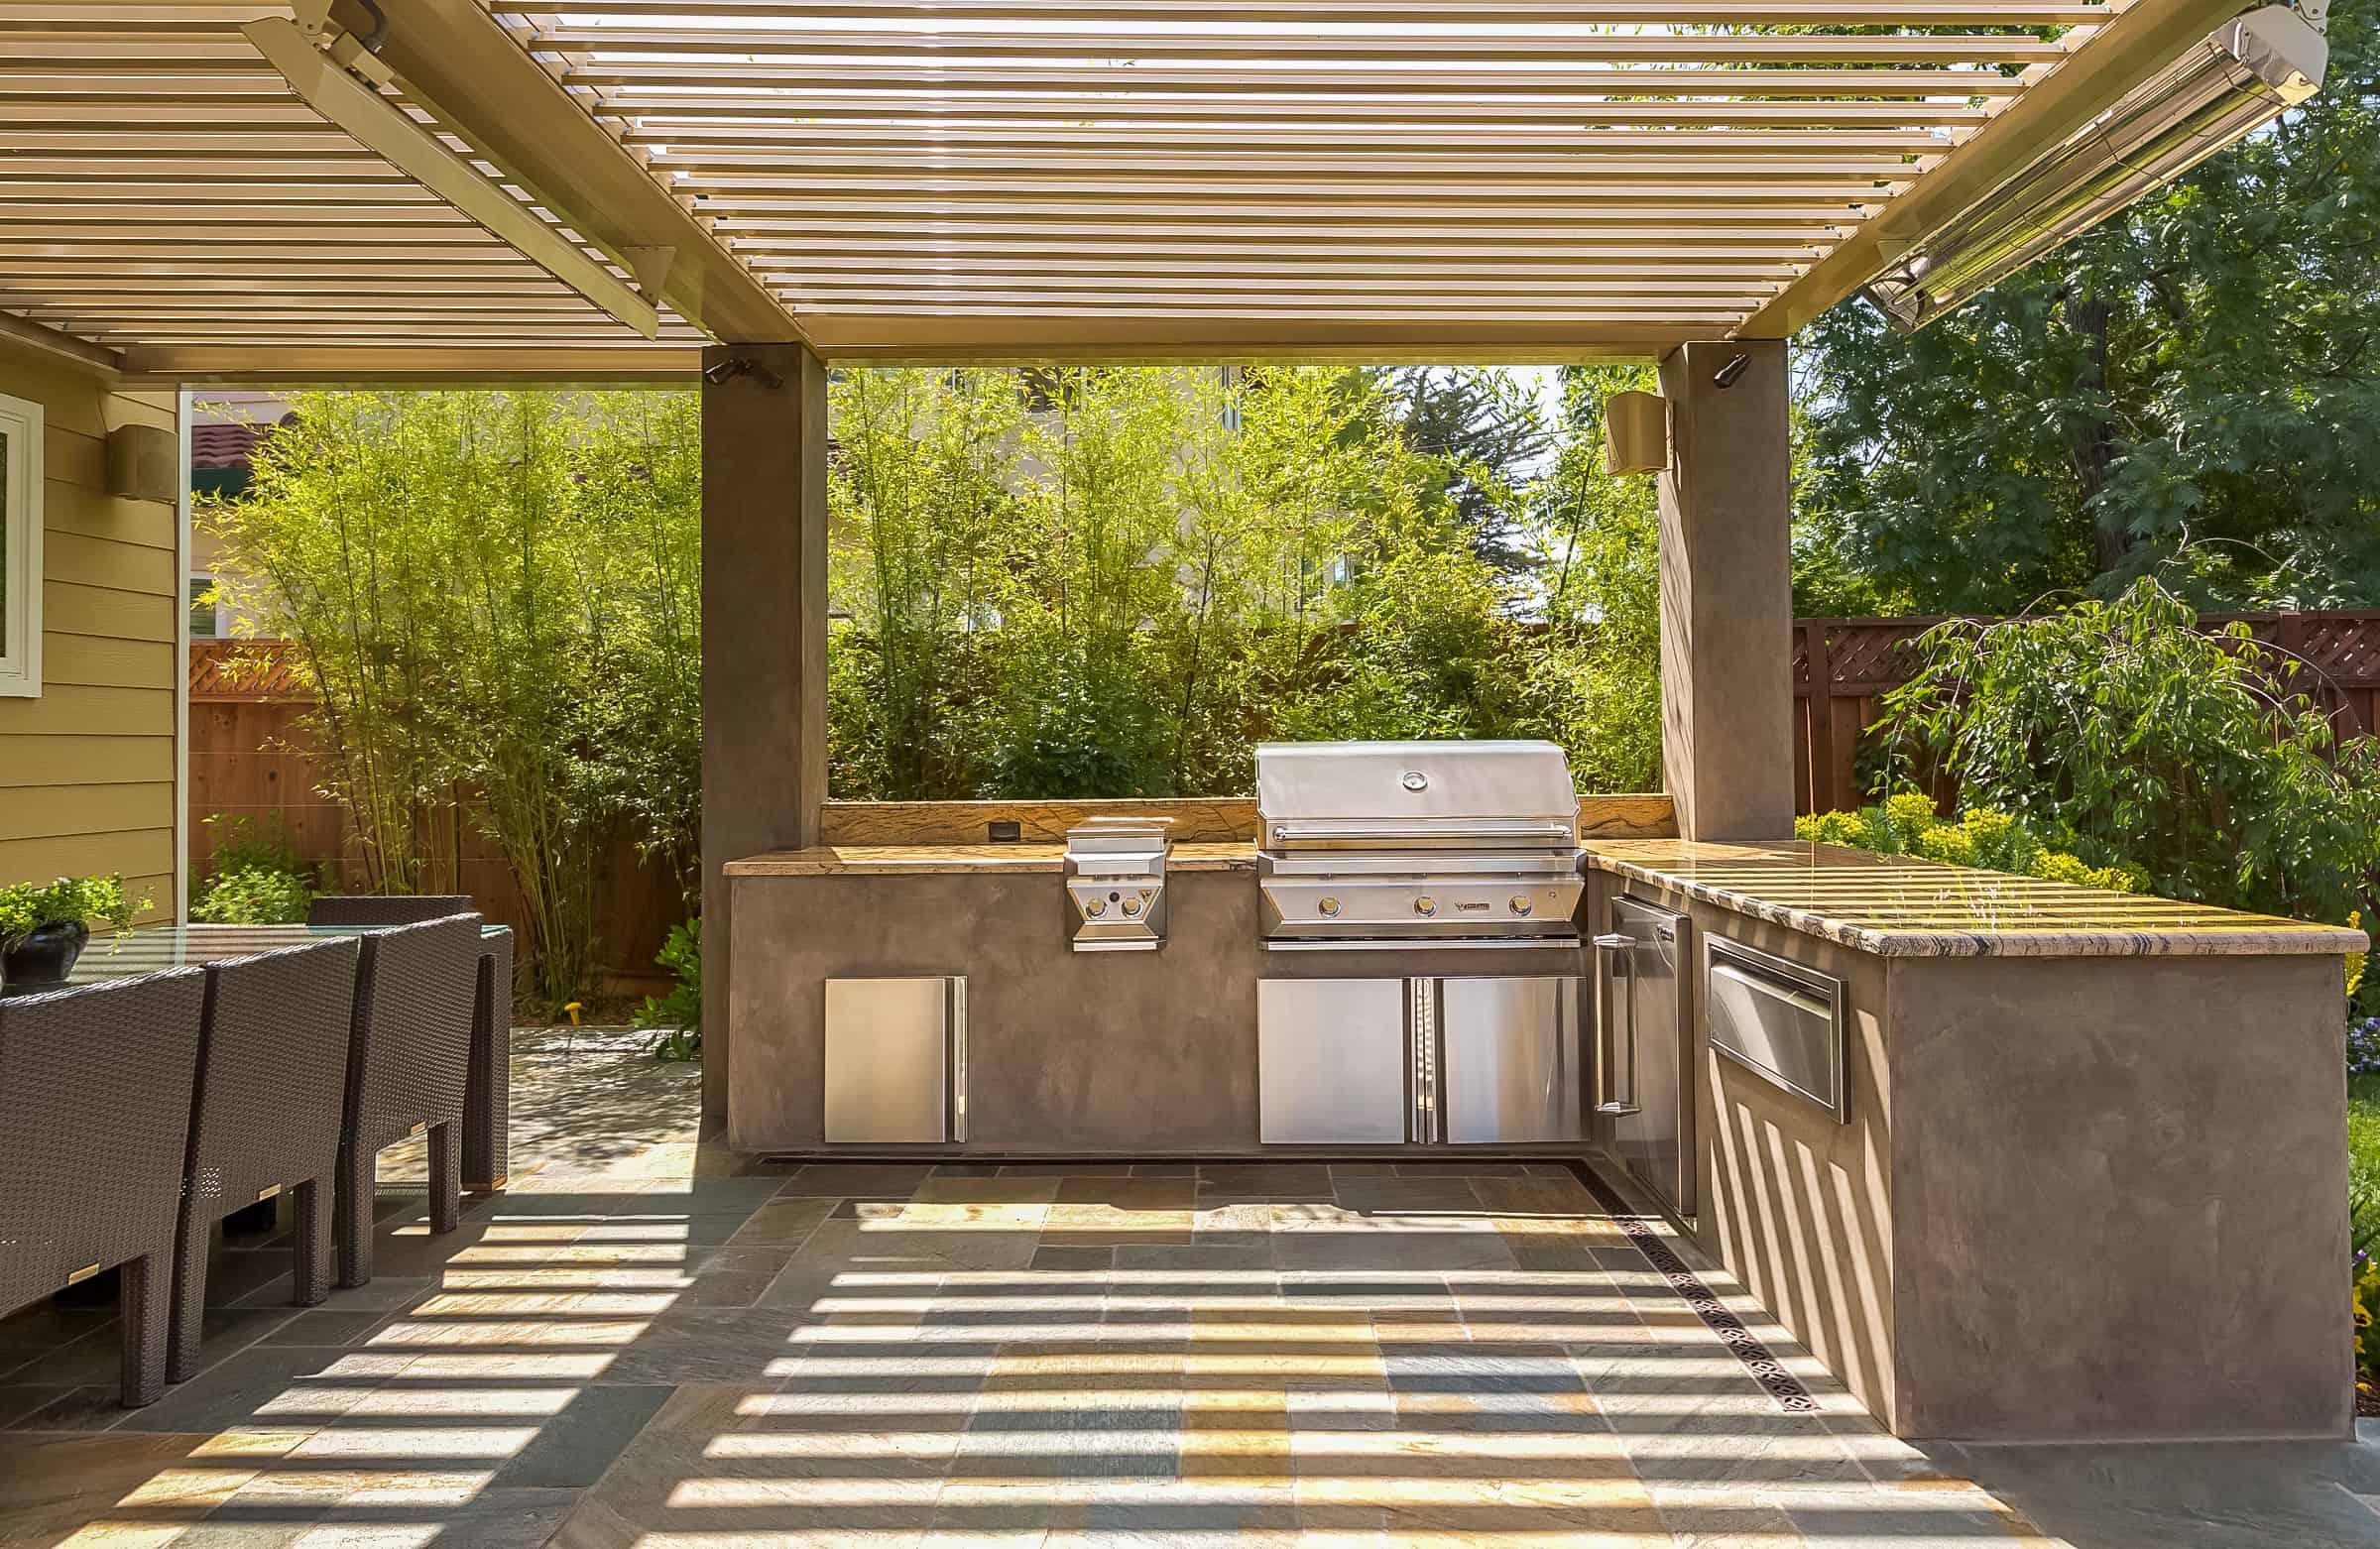 Pergolas by Julie - Pergola over a custom outdoor kitchen